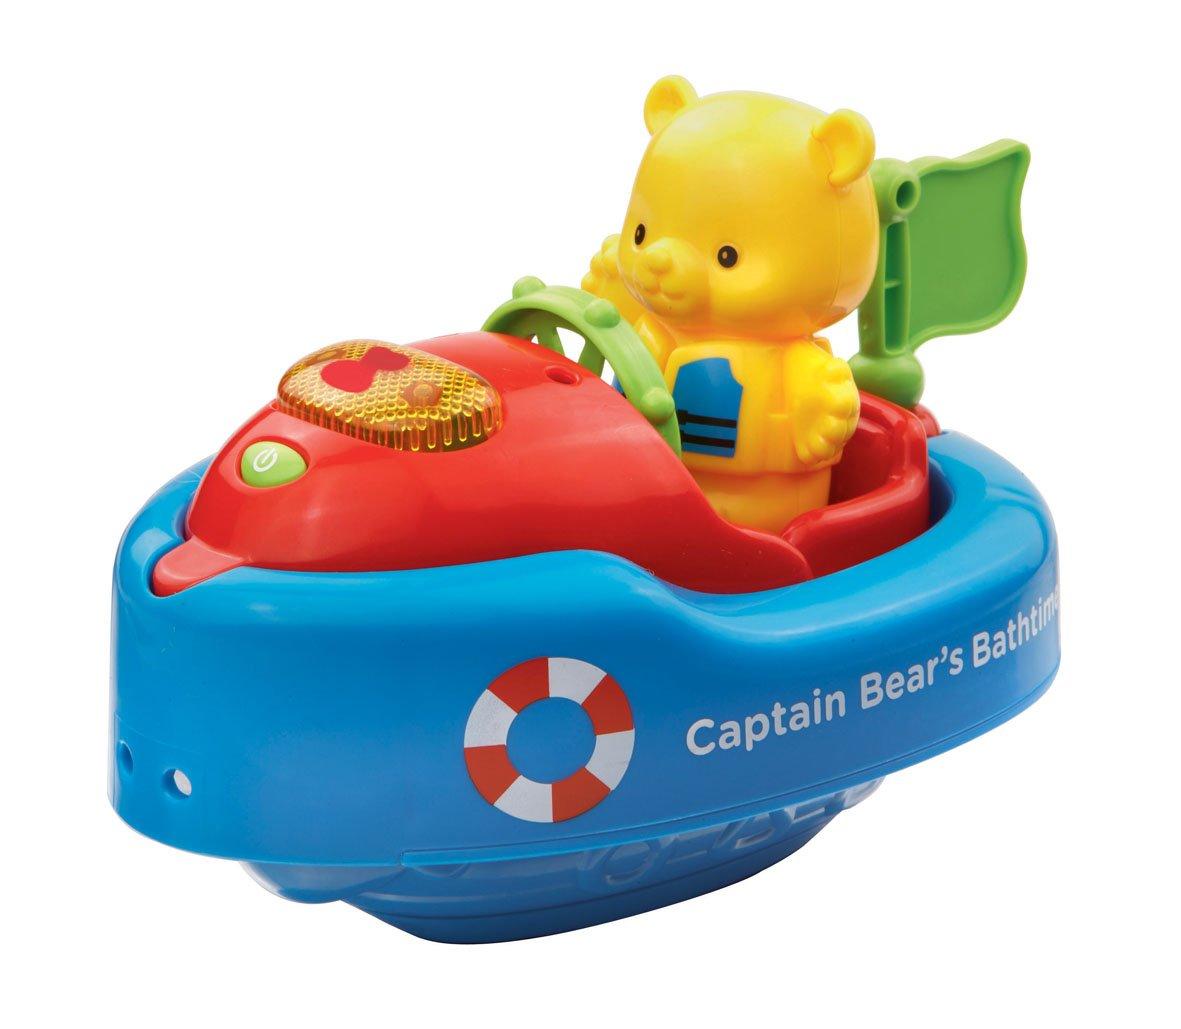 Vtech Bath Toy Captain Bear\'s Bathtime: Amazon.co.uk: Toys & Games